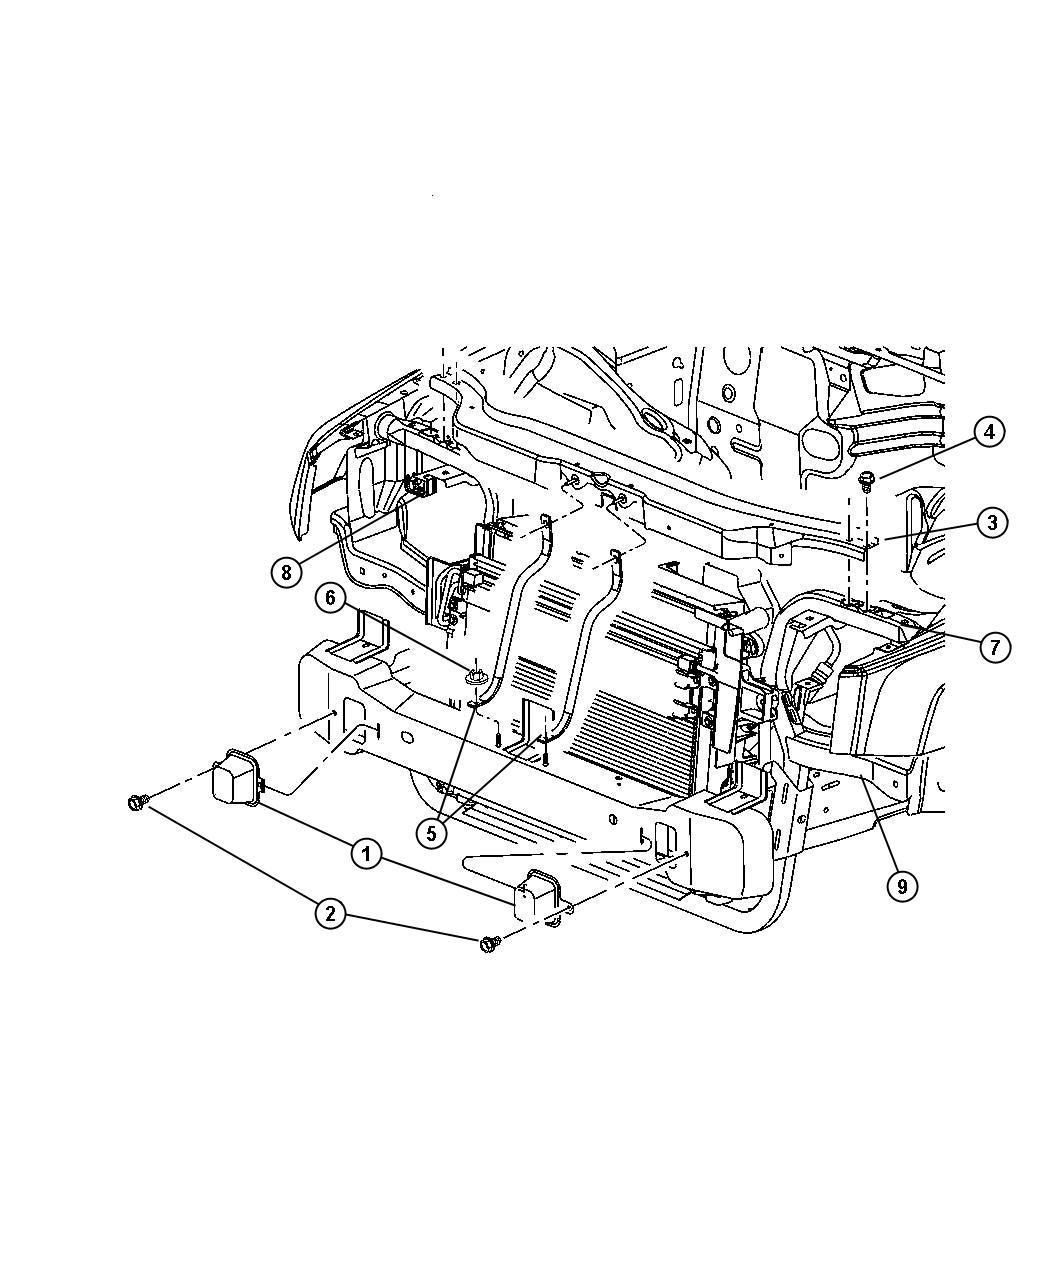 tags: #jeep wrangler tj seats#jeep wrangler tj wheels#jeep wrangler tj  frame#jeep wrangler radiator supports#2001 jeep wrangler radiator#jeep  wrangler tj